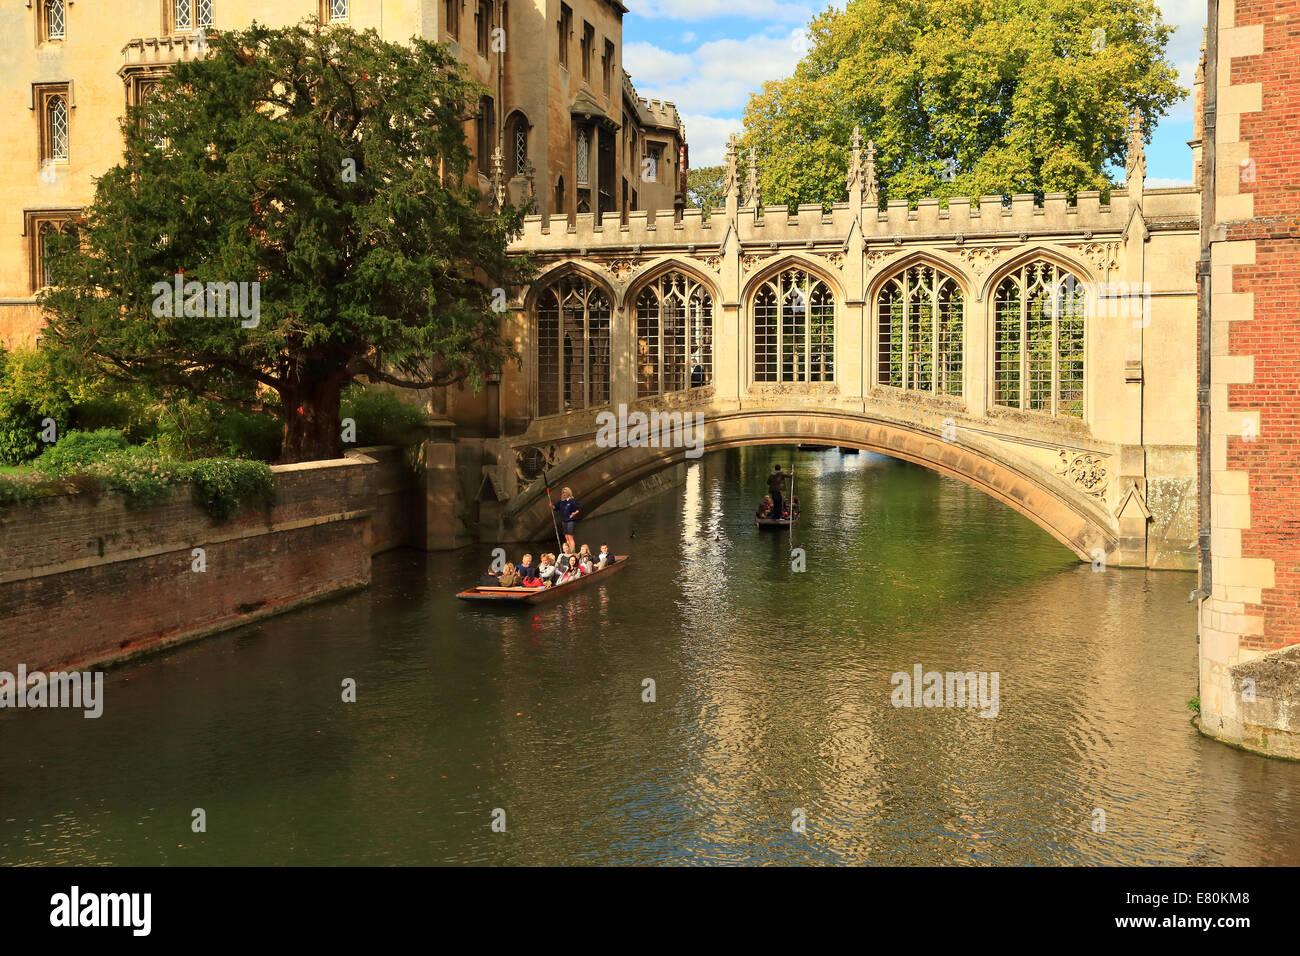 Punting under the Bridge of Sighs, St John's college, Cambridge, UK. - Stock Image